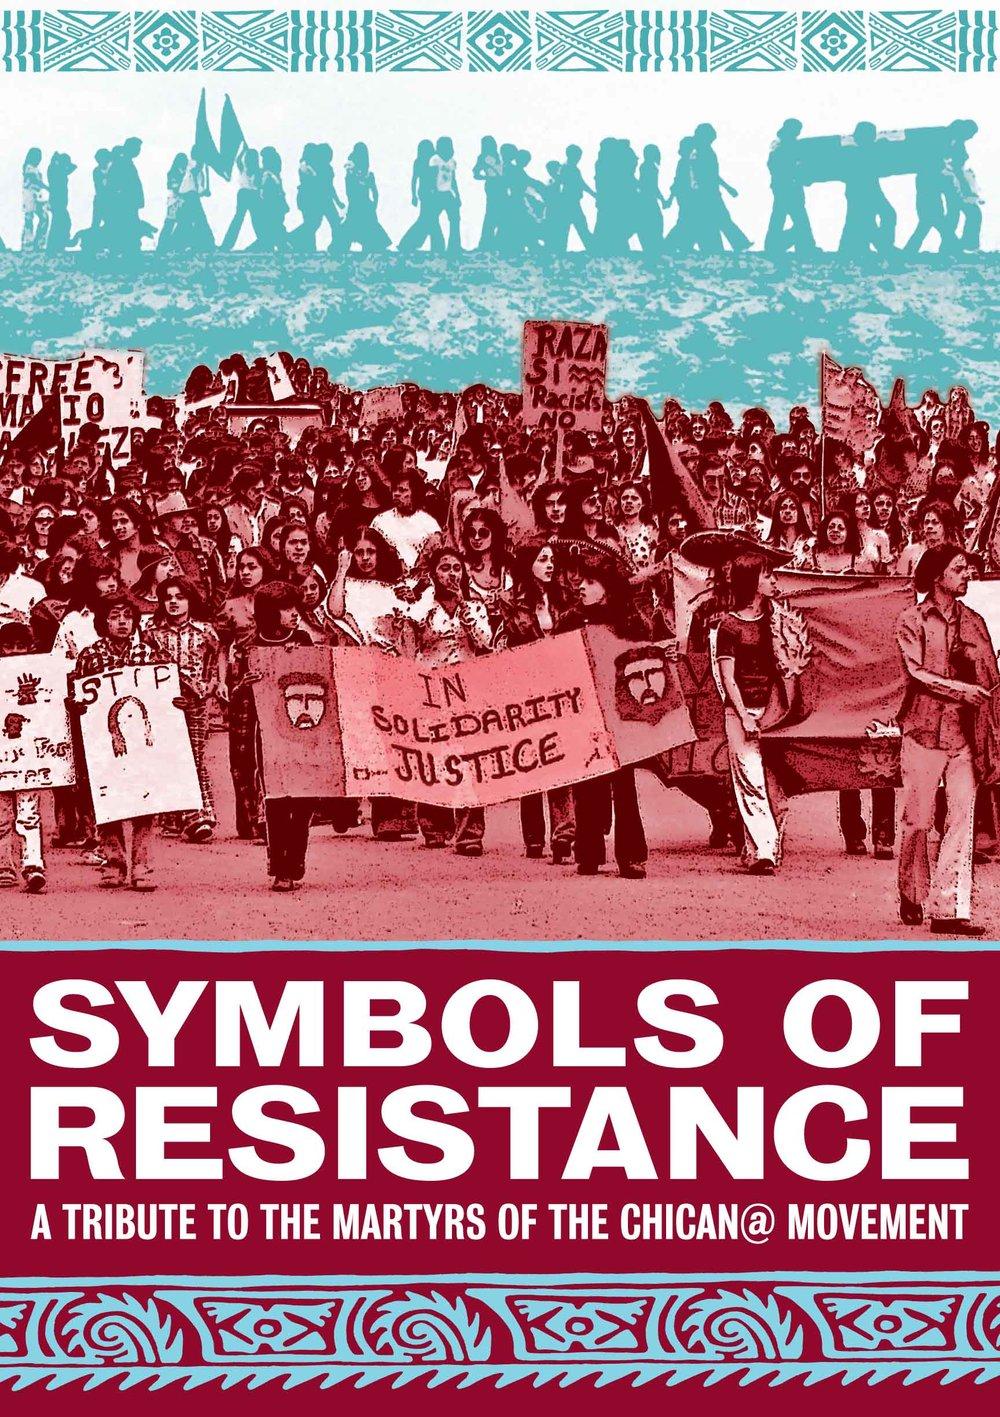 Symbols of Resistance Poster. Design: Jesus Barraza - Dignidad Rebelde.